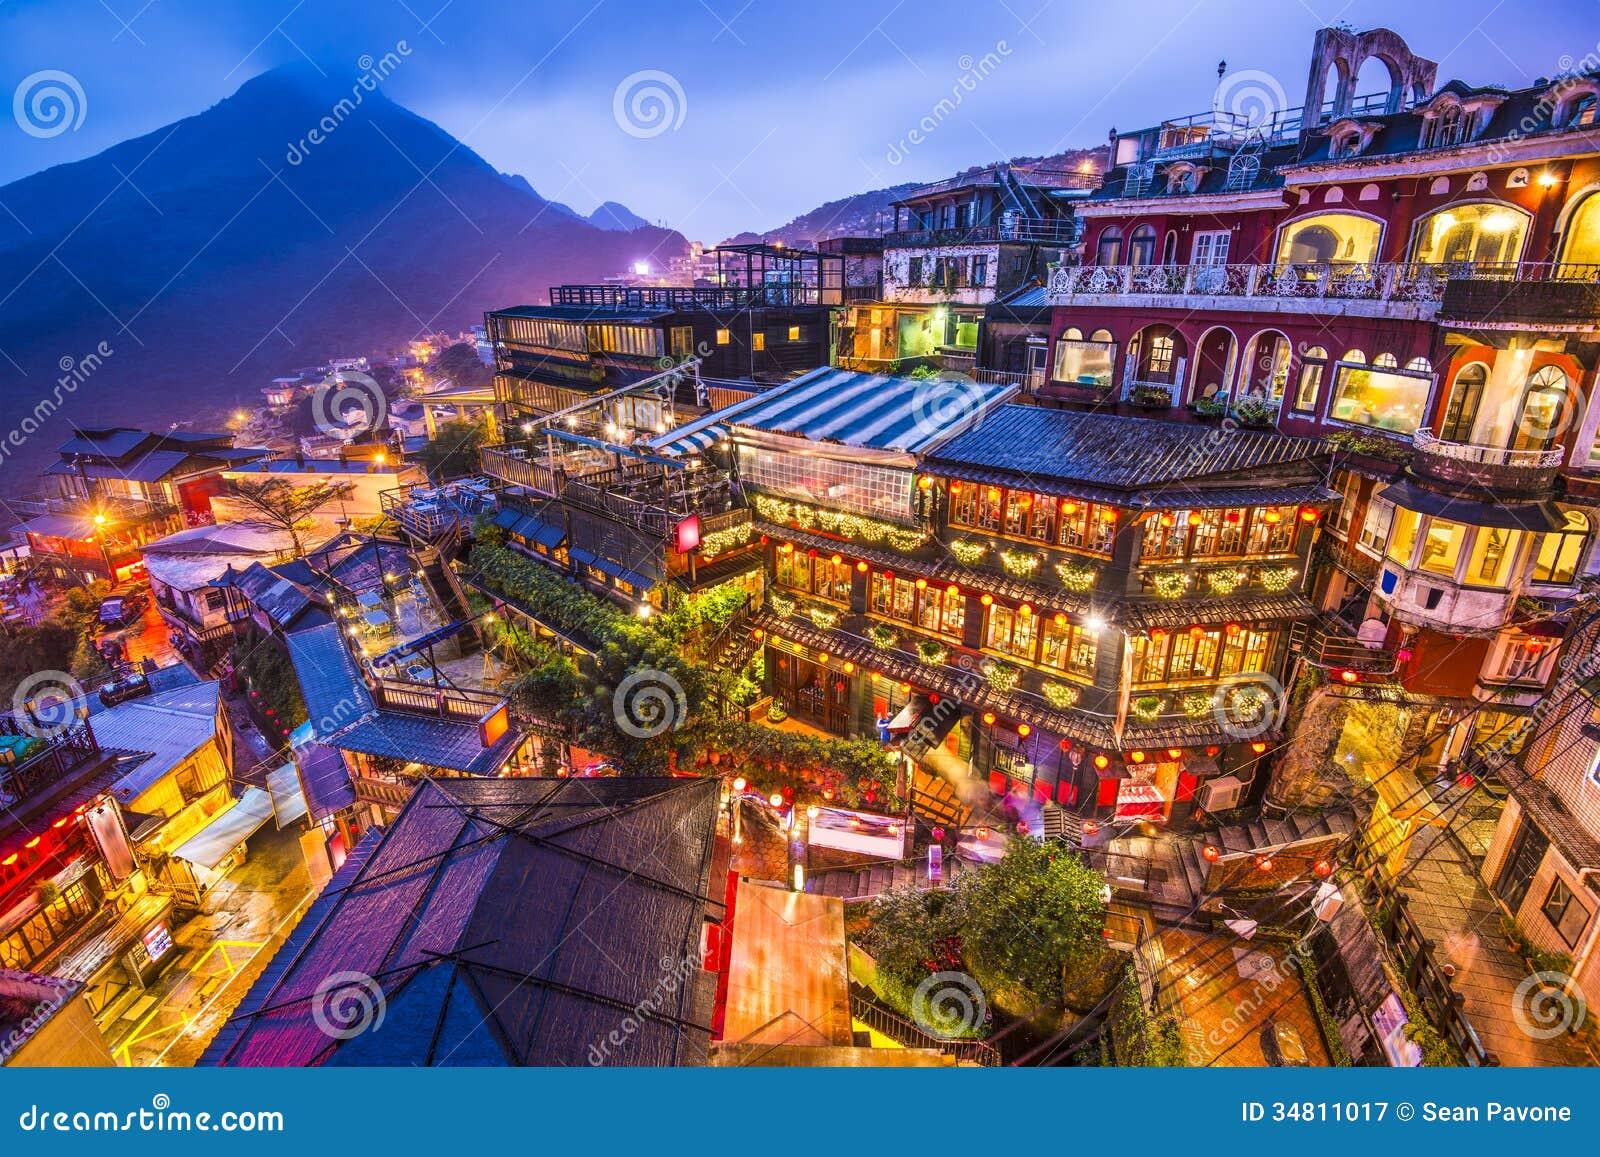 Taiwan Photography